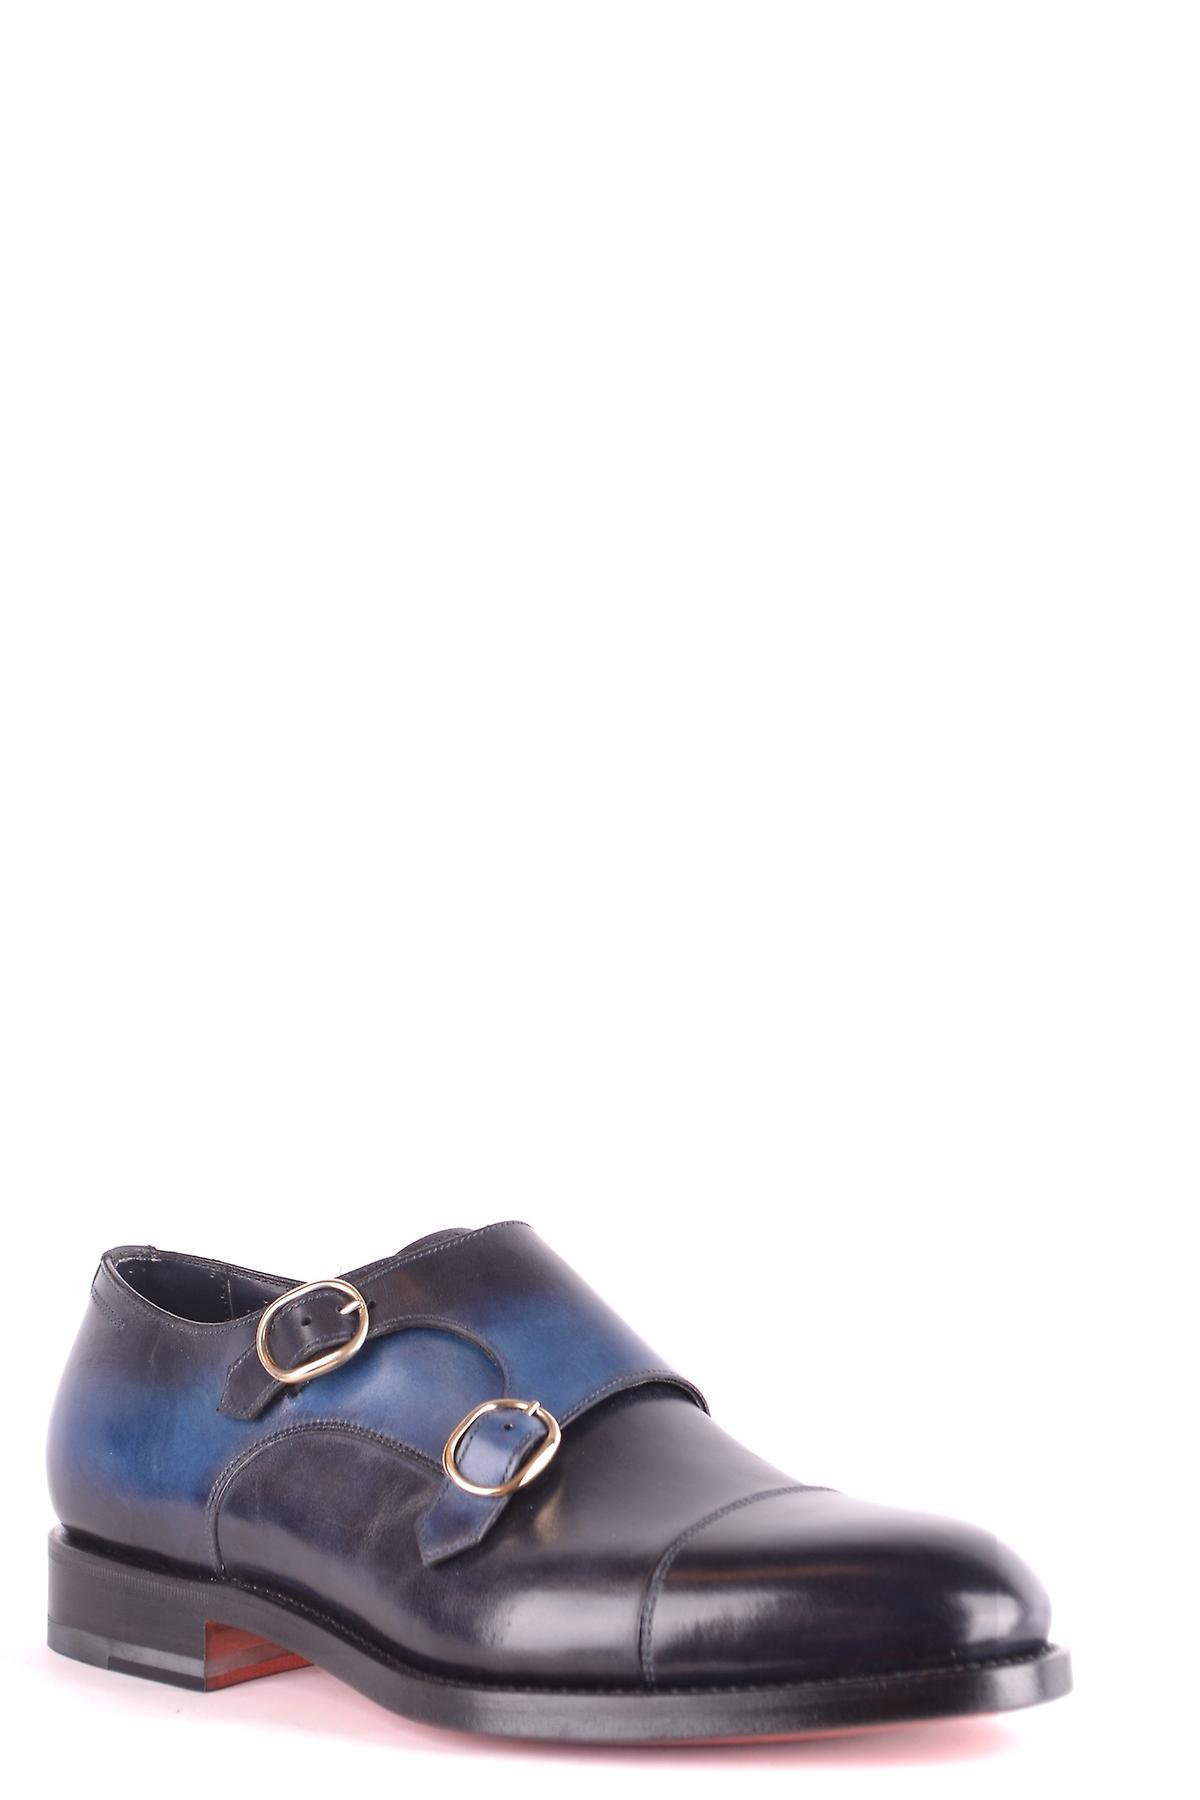 Chaussures Santoni Mcco1397mc1hslpu55 Men-apos;s Blue Leather Monk Strap Chaussures